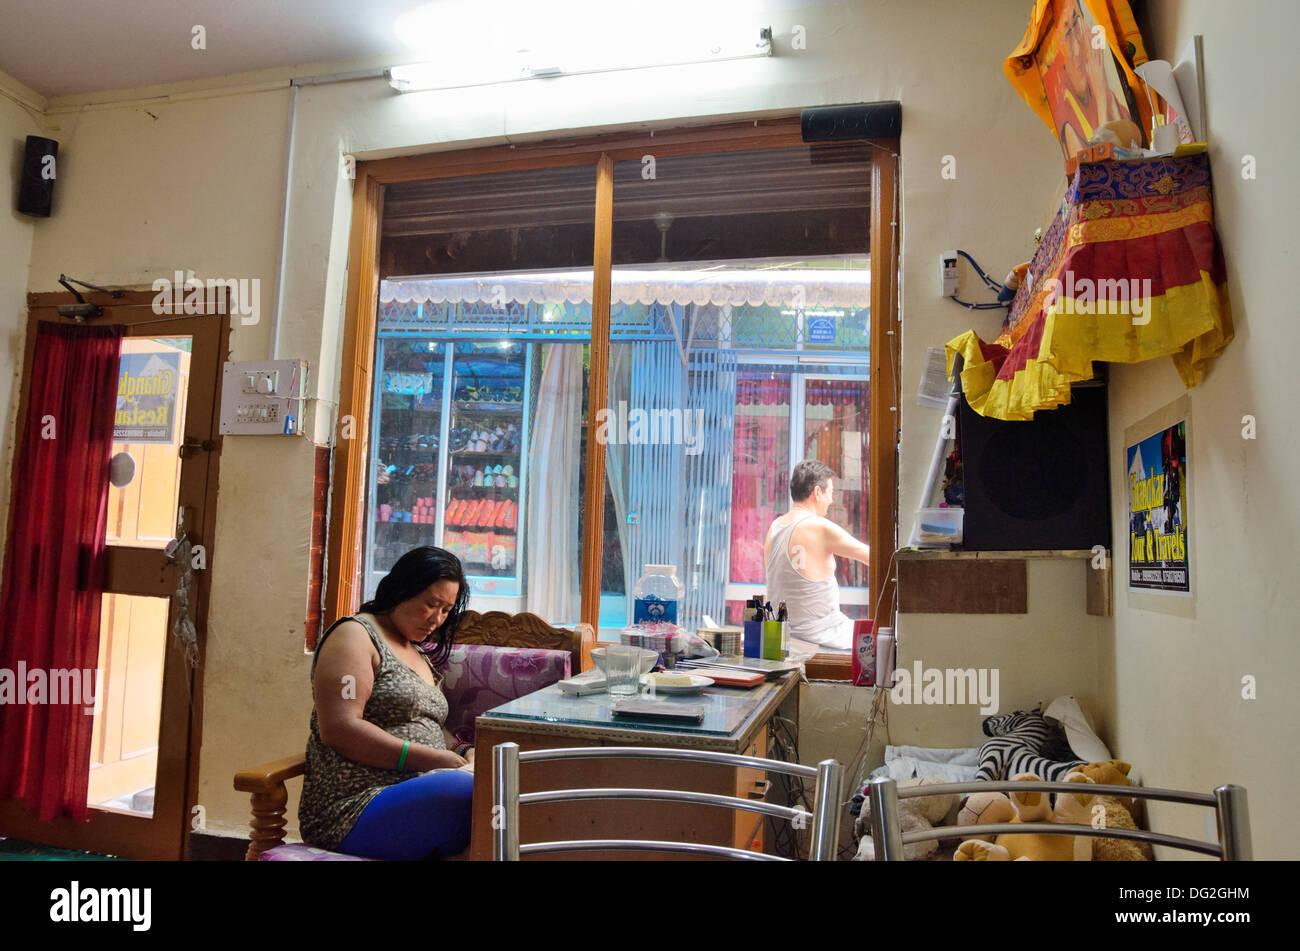 Tibetan Cafe And Living Room In Majnu Ka Tilla Refugee Colony, Delhi, India